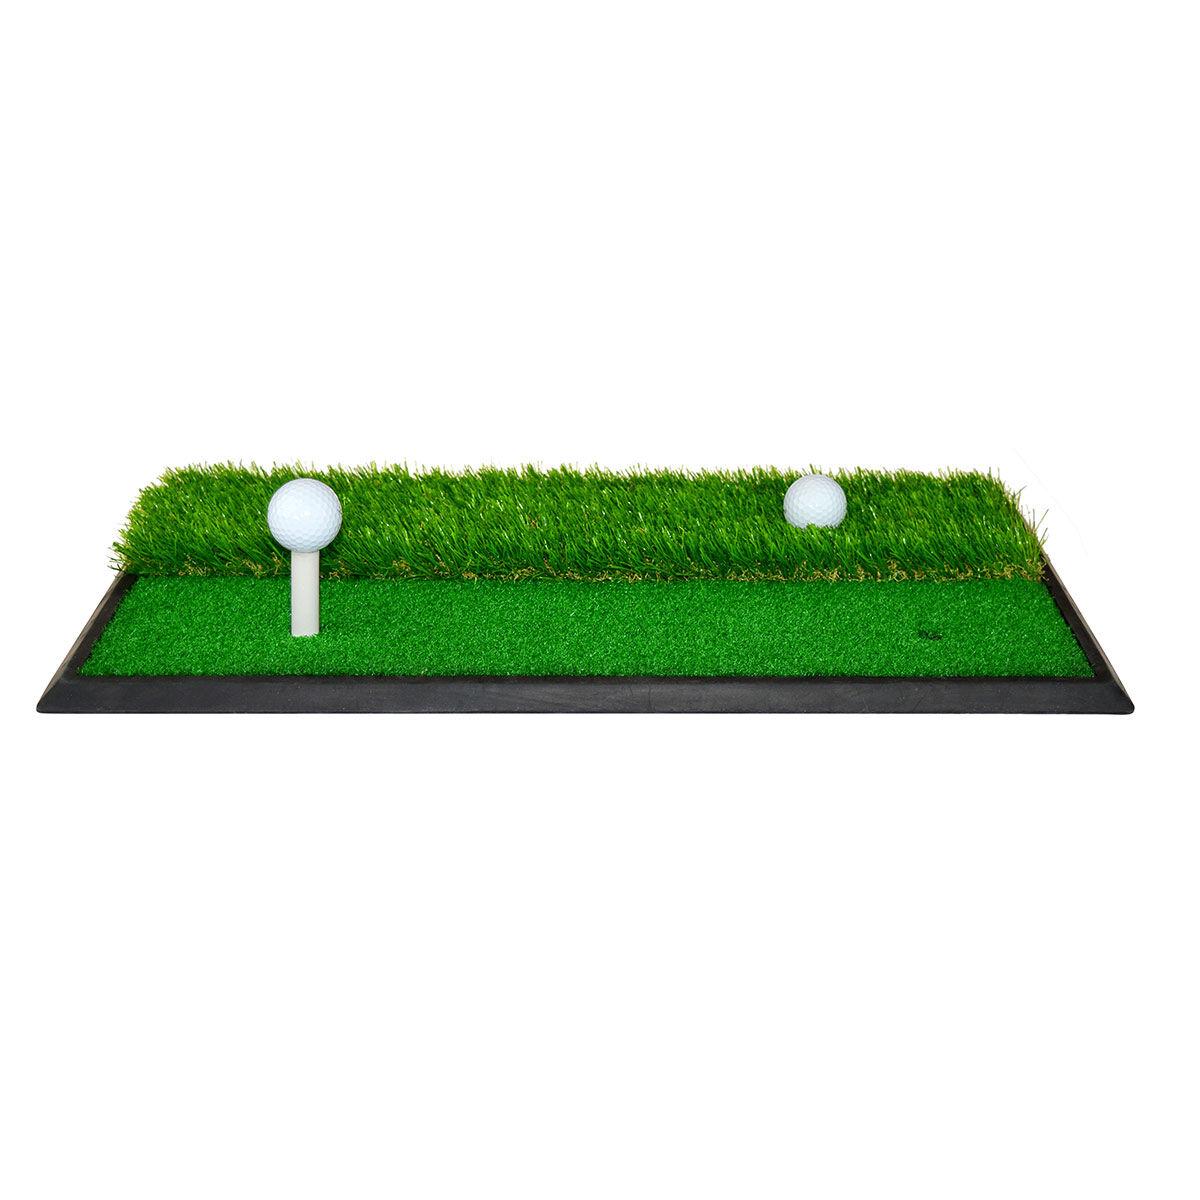 PGA Tour 2 in 1 Turf Practice Mat, Male, Medium, Pink/black | American Golf